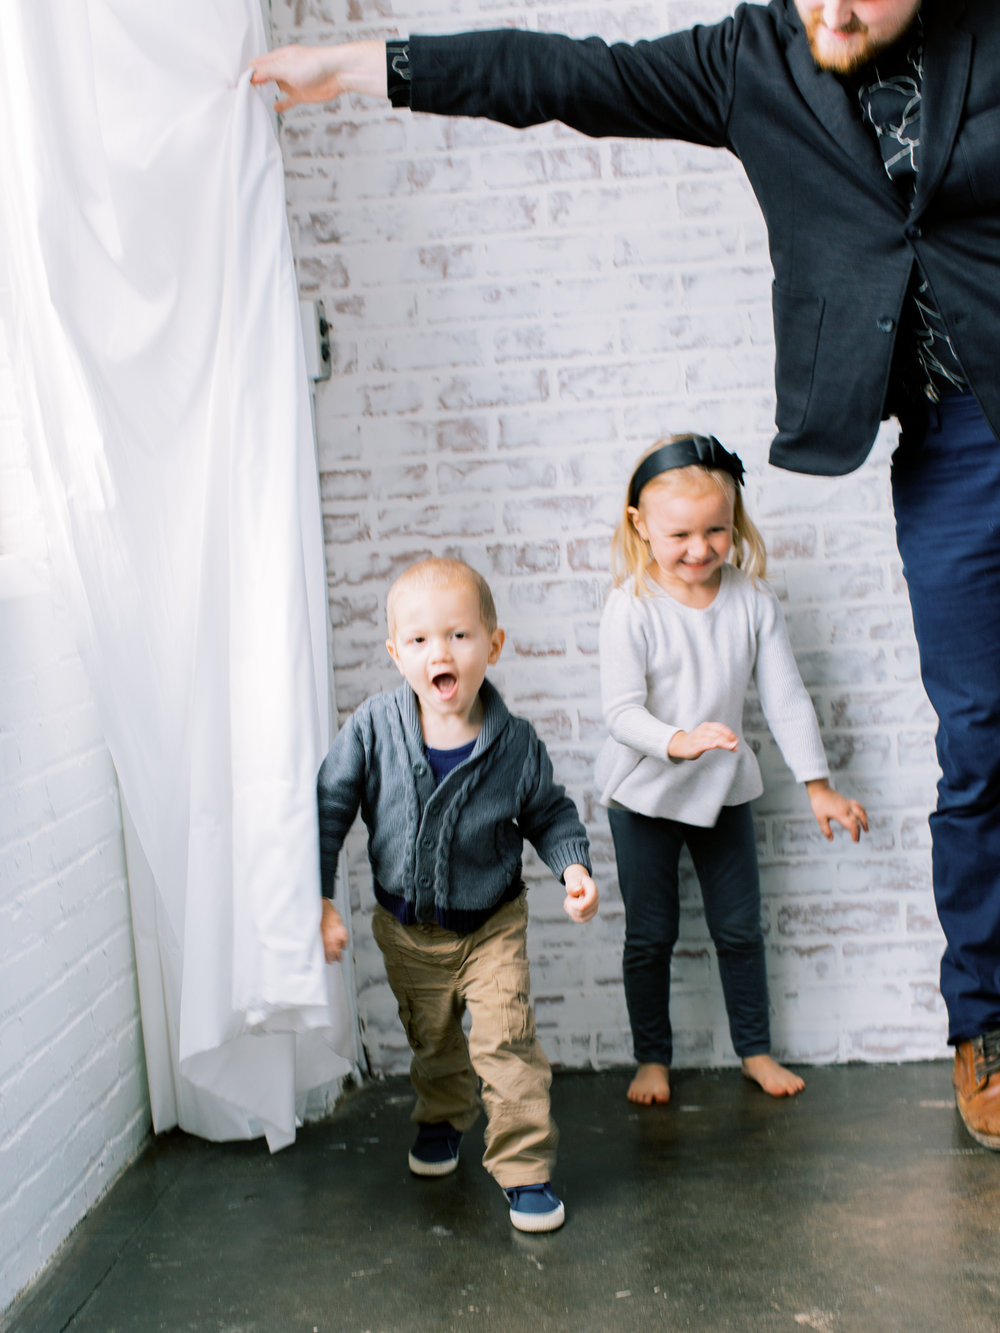 pittsburgh-newborn-family-photographer-Steven-Dray-family-anna-laero-photography-11.jpg